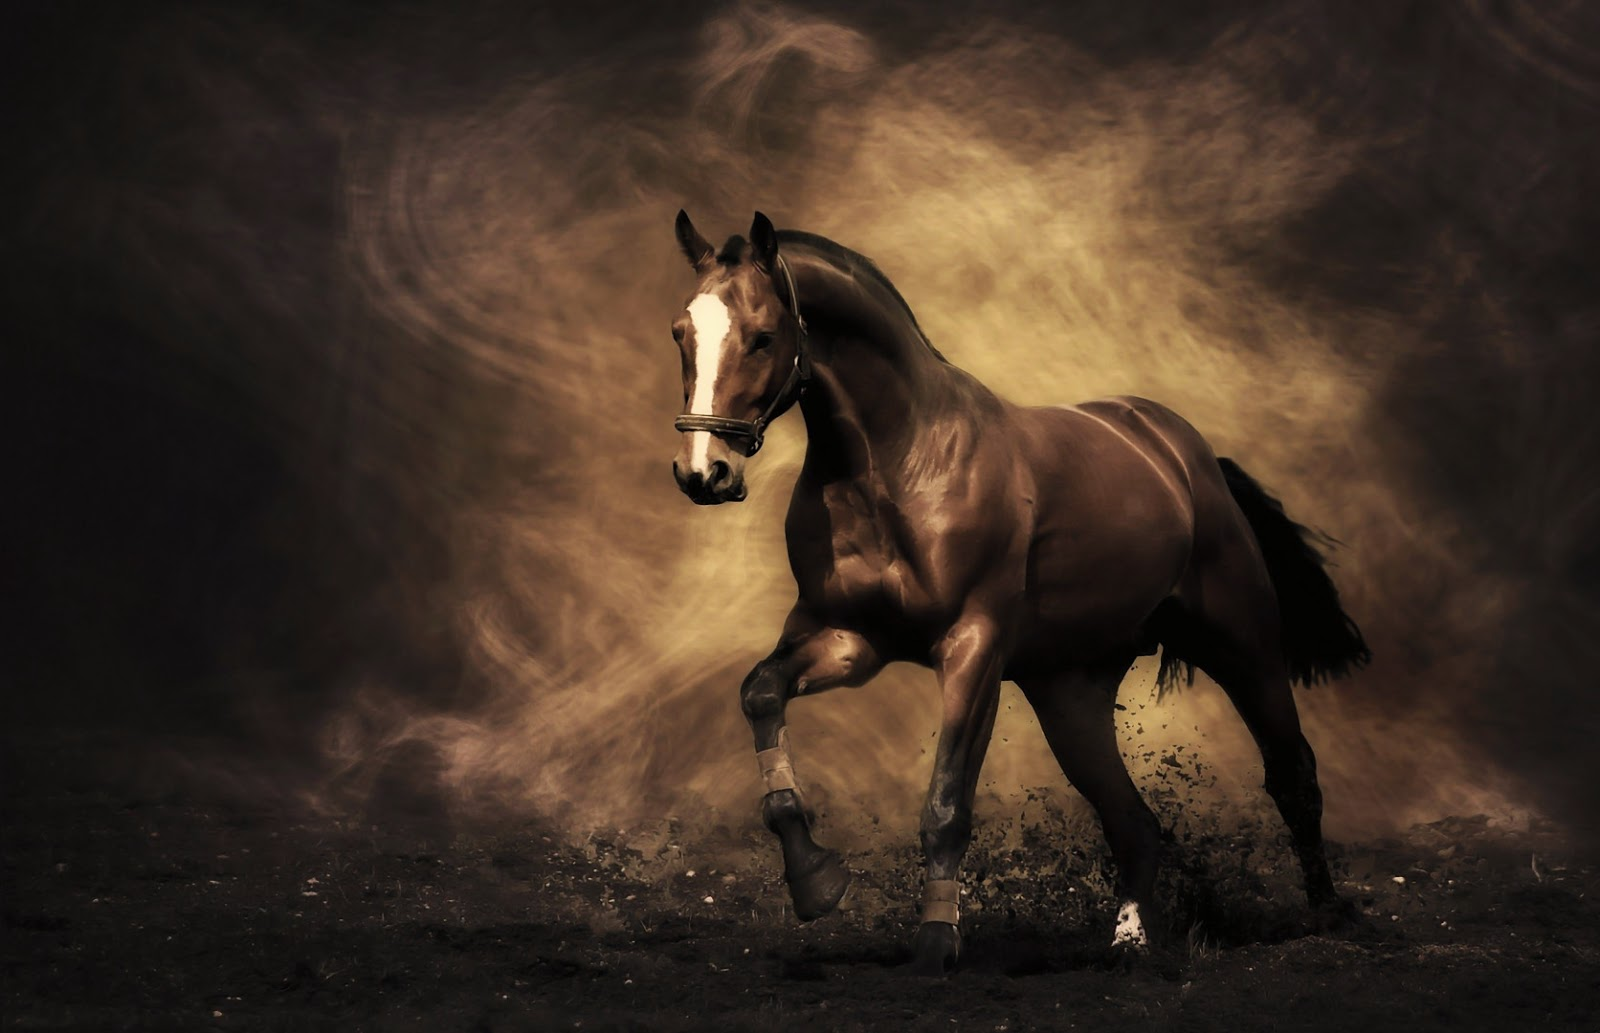 Vaquero Horse Backgrounds